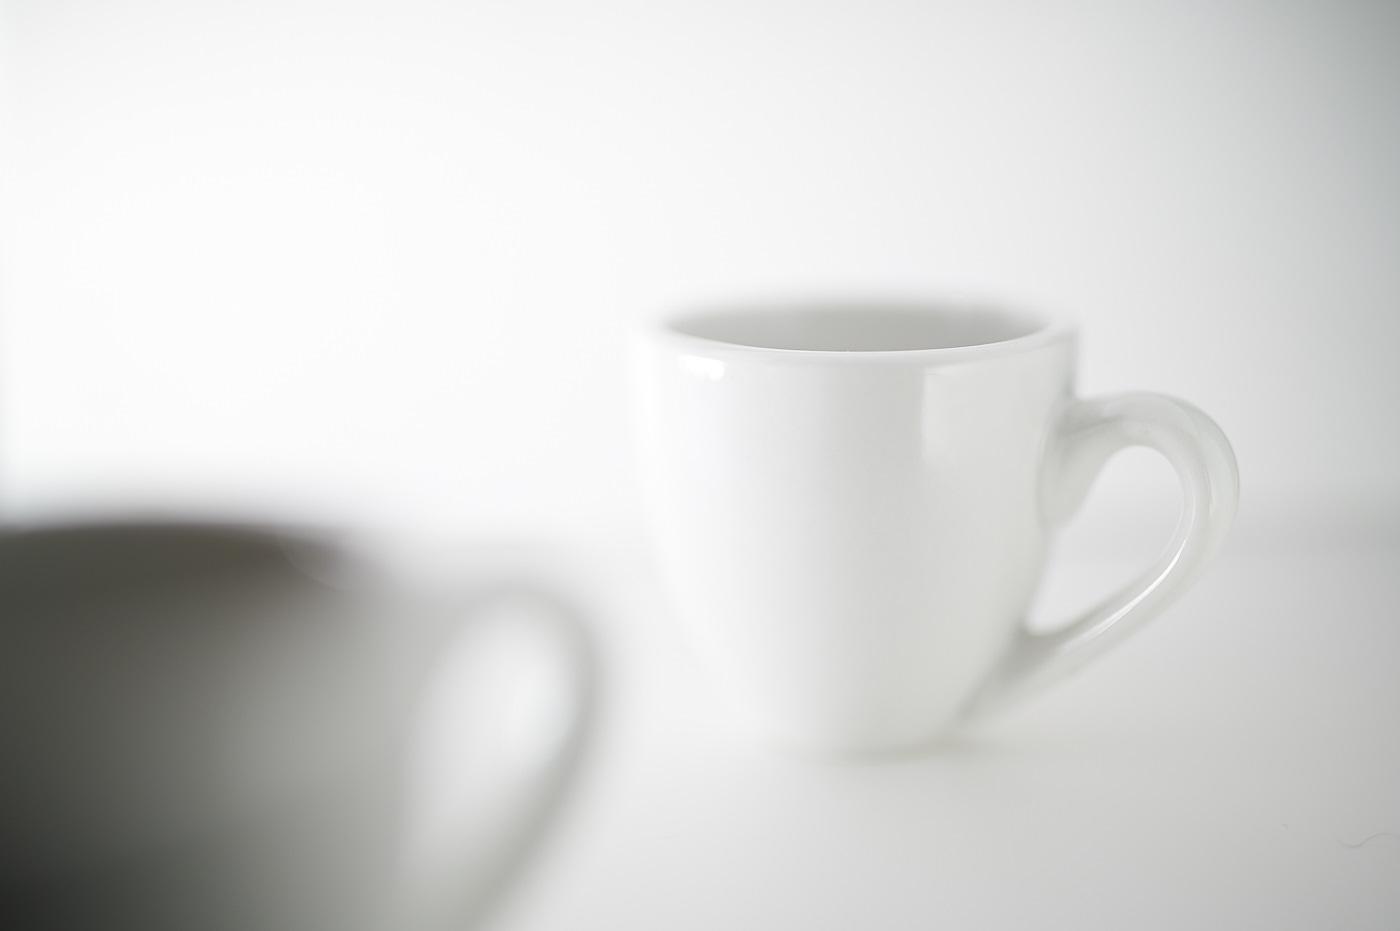 espresso coffee cup on white